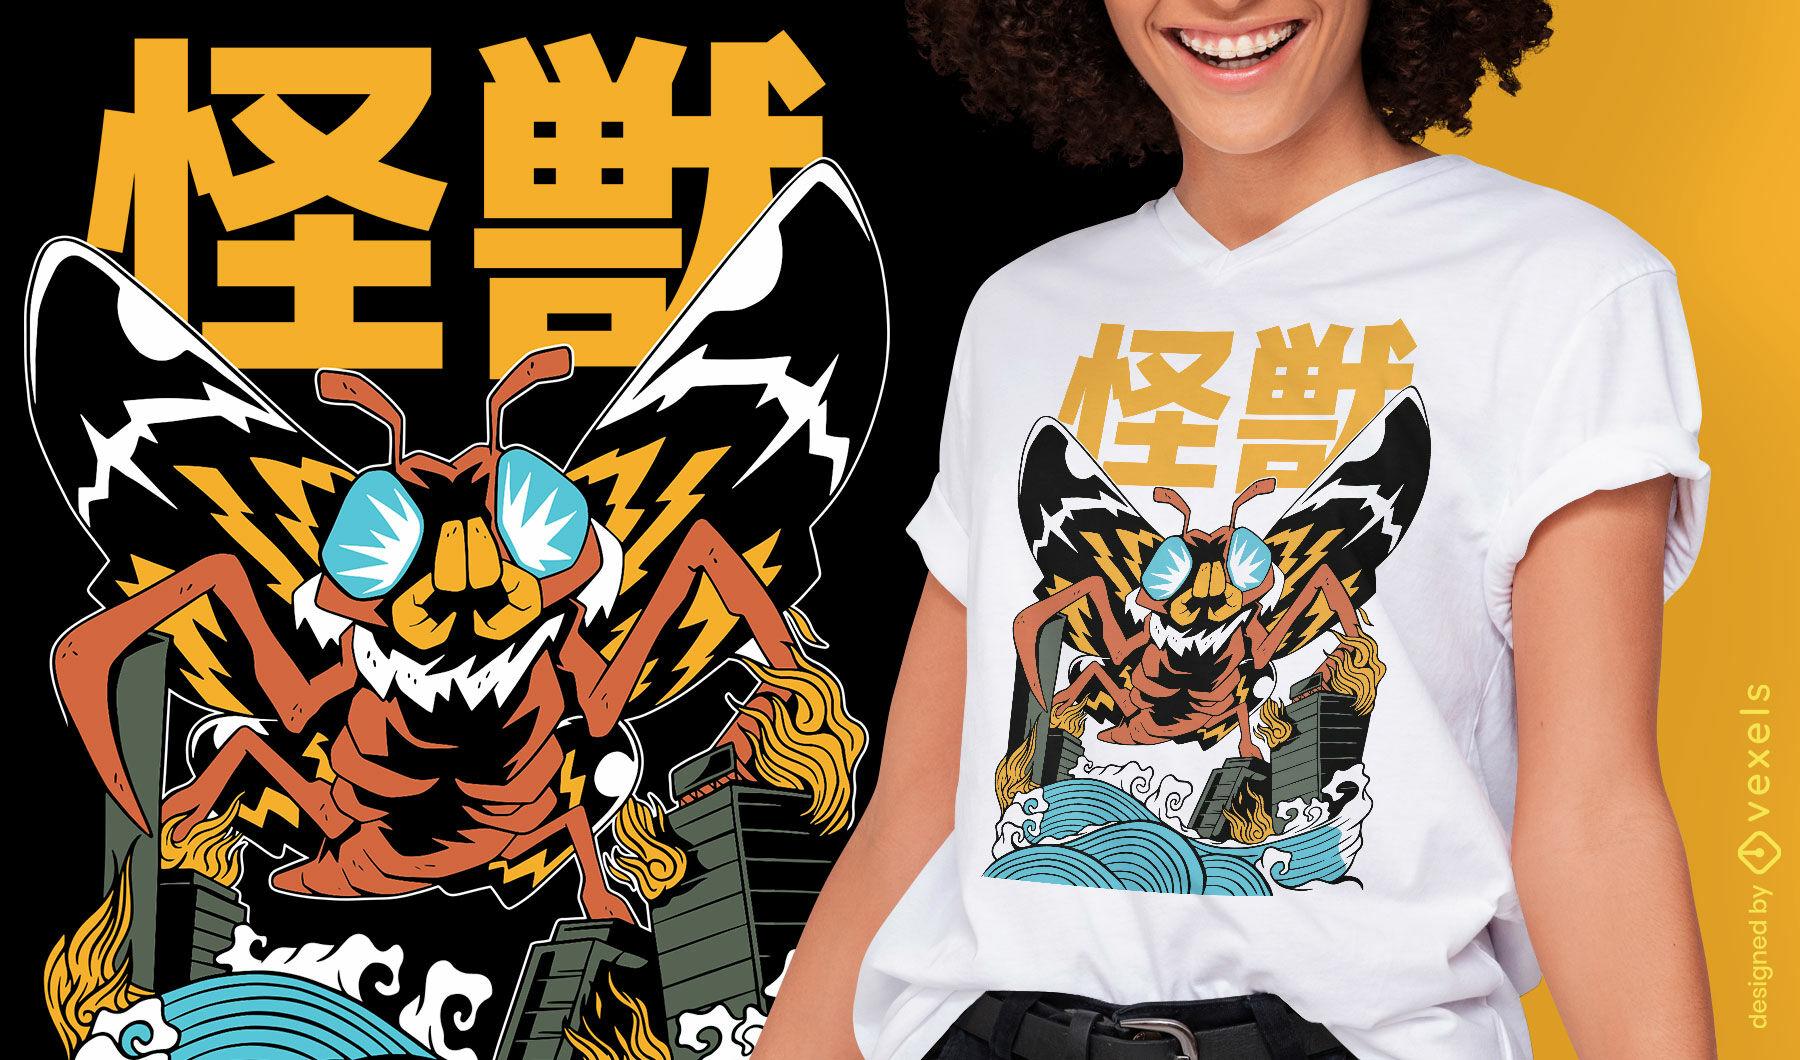 Diseño de camiseta de polilla monstruo japonés.